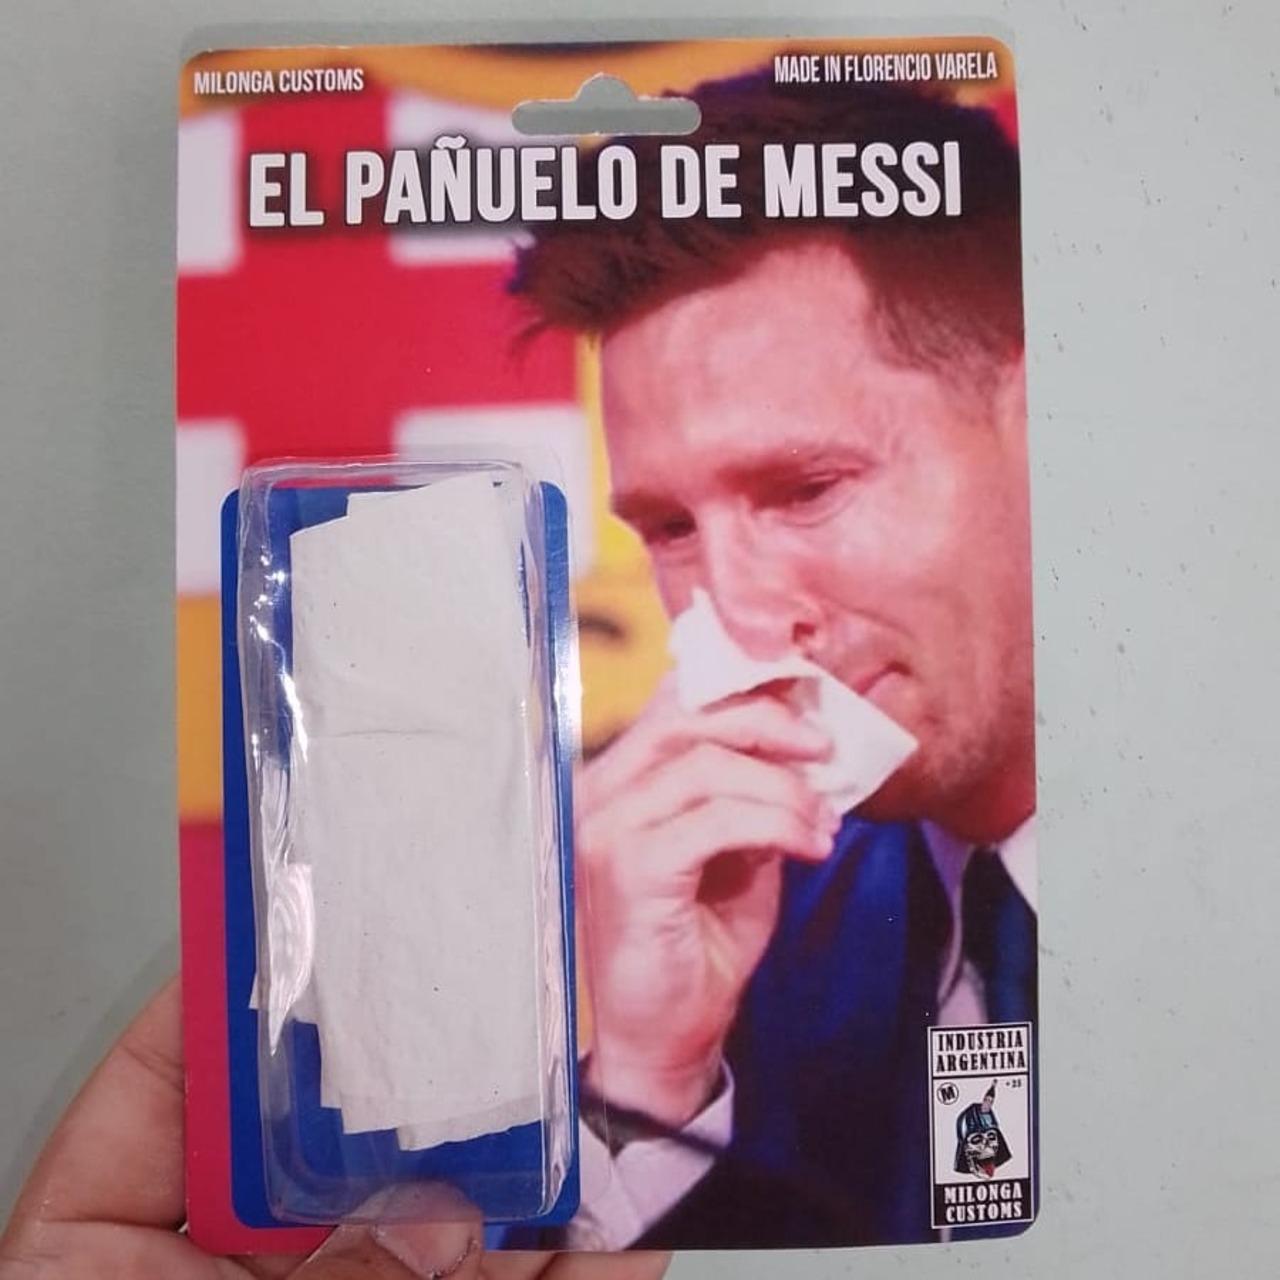 Pañuelo Leo Messi réplica